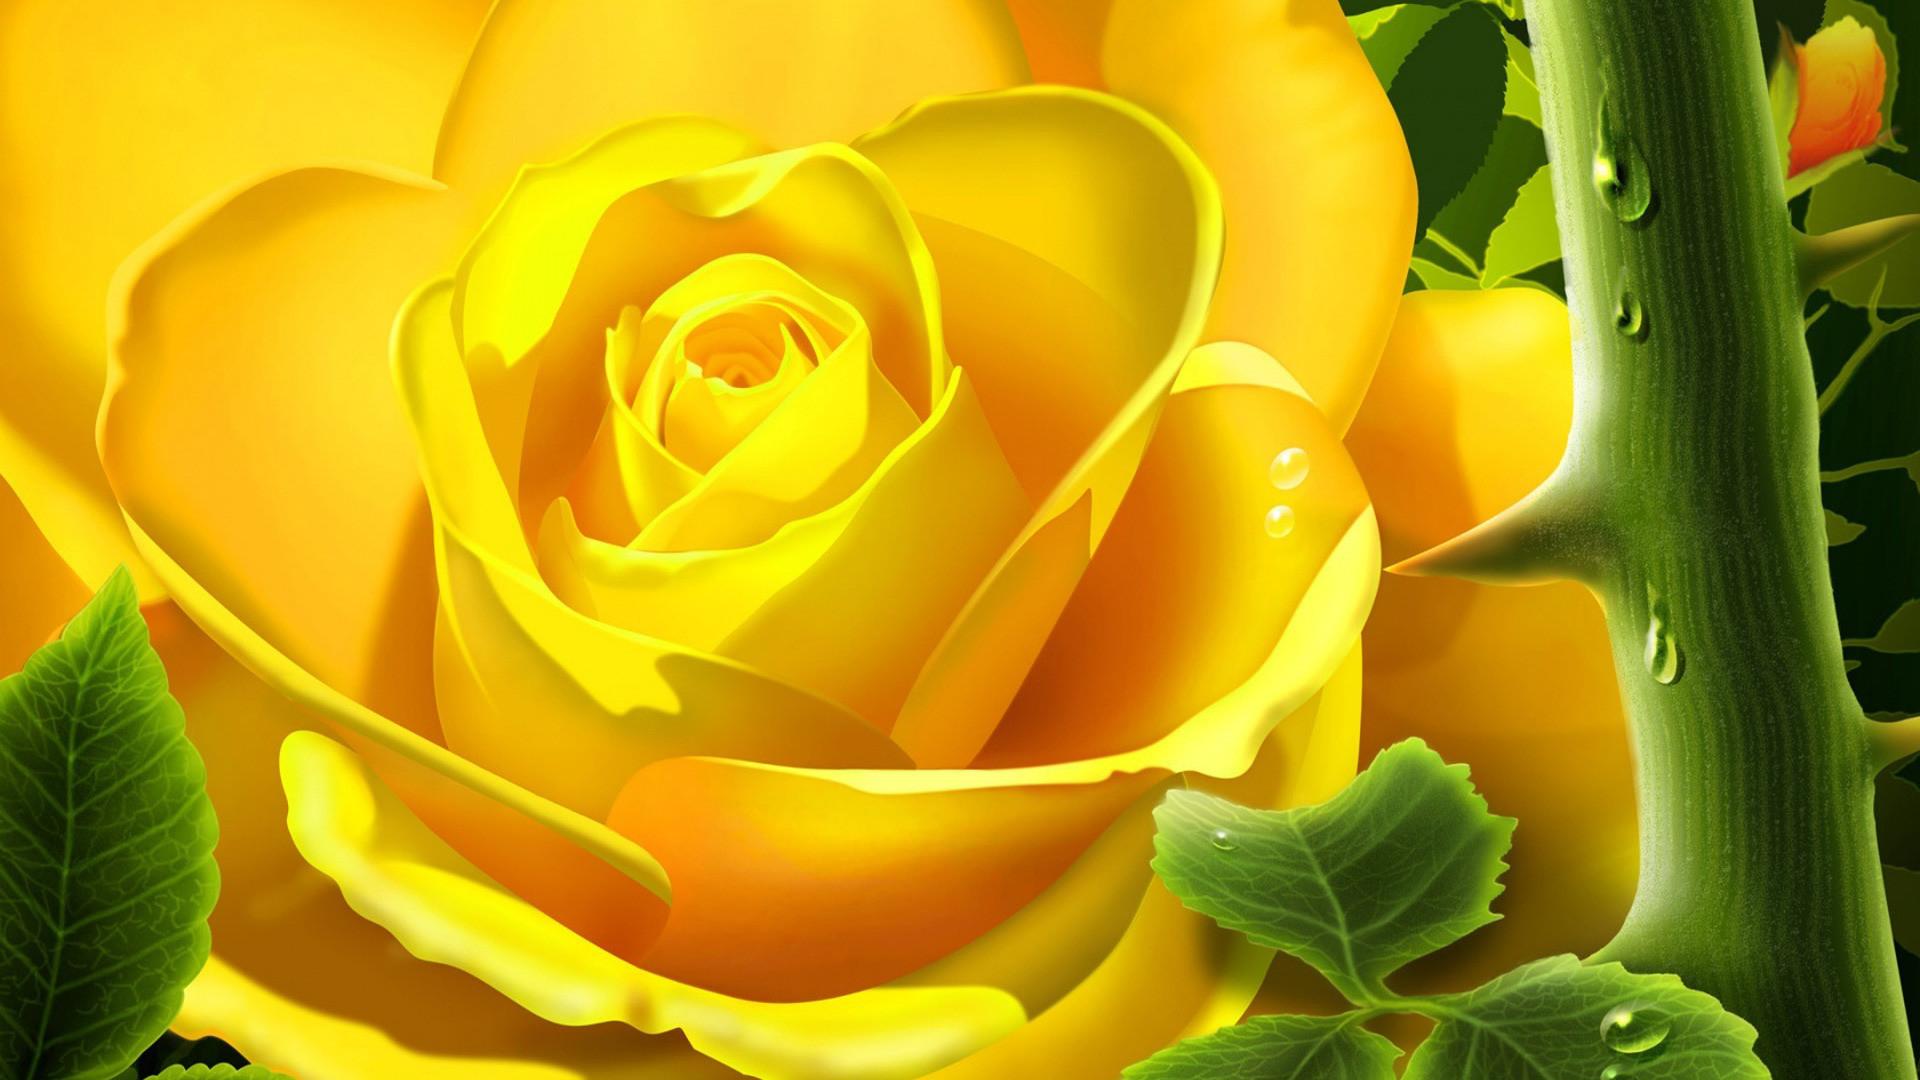 Fxa41 4k Ultra Hd Yellow Rose Wallpapers Yellow Rose - Yellow Rose Good Morning , HD Wallpaper & Backgrounds